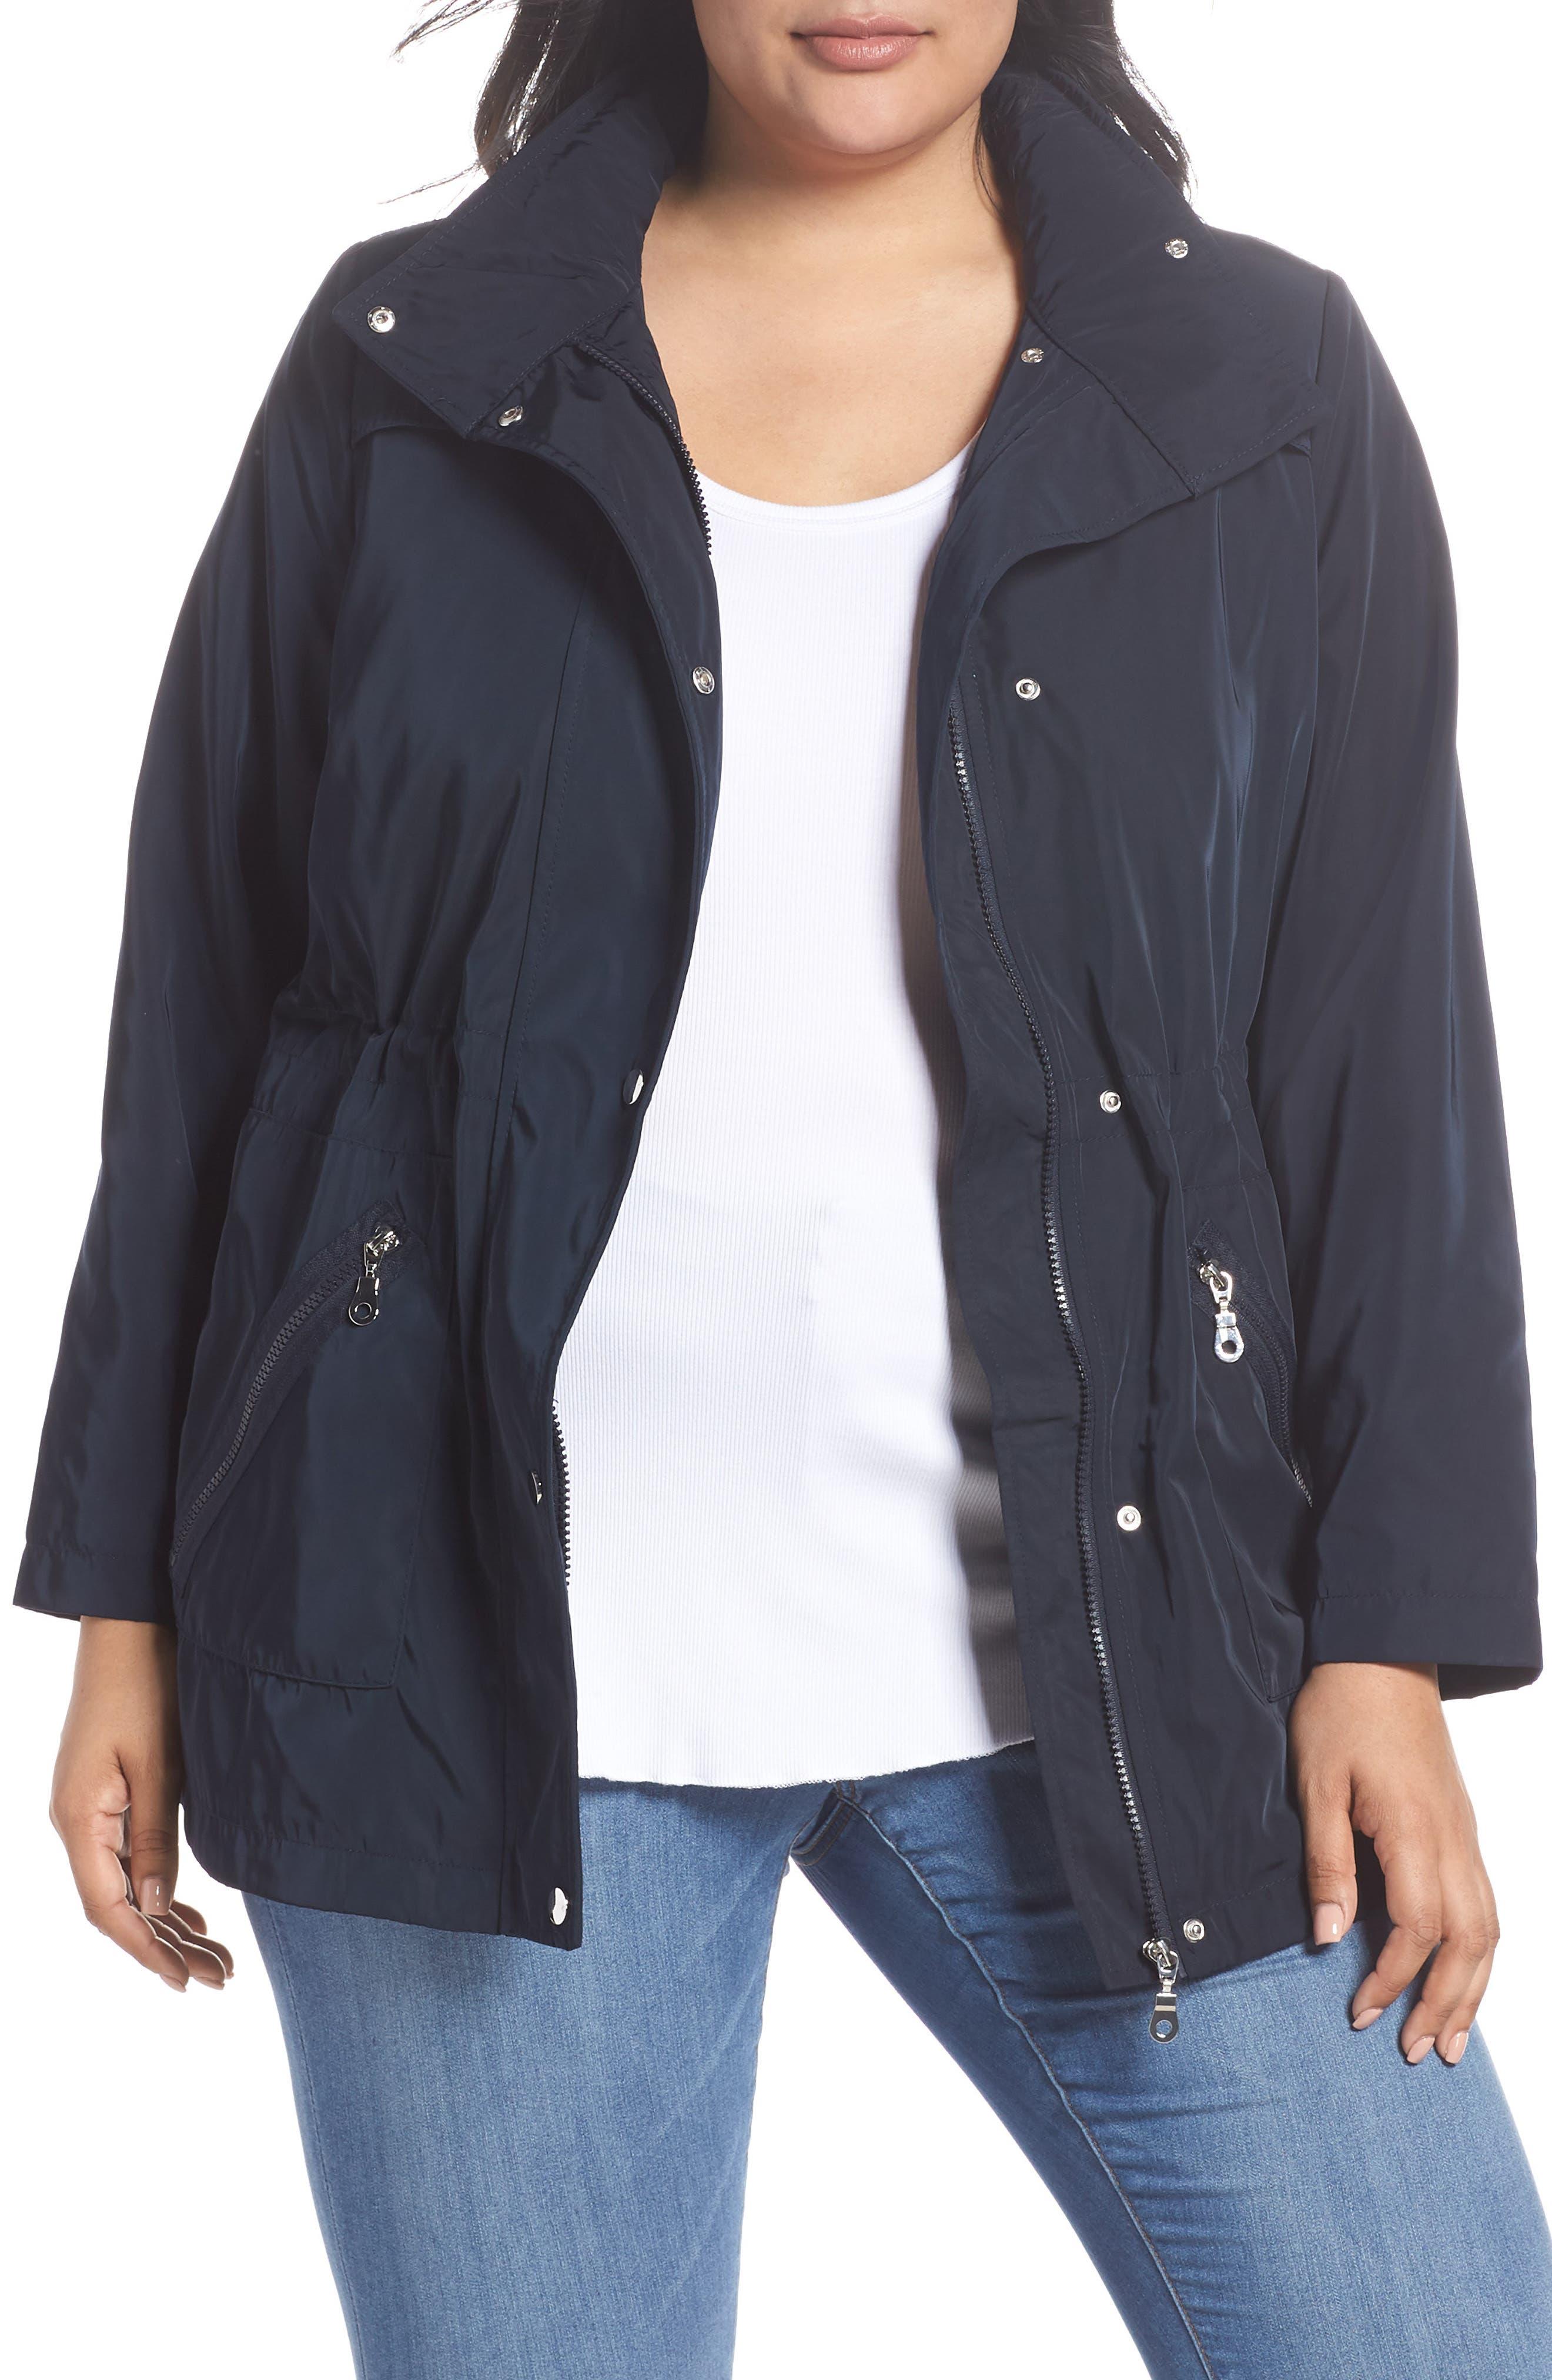 Zip Trim Jacket,                         Main,                         color, Navy Blue